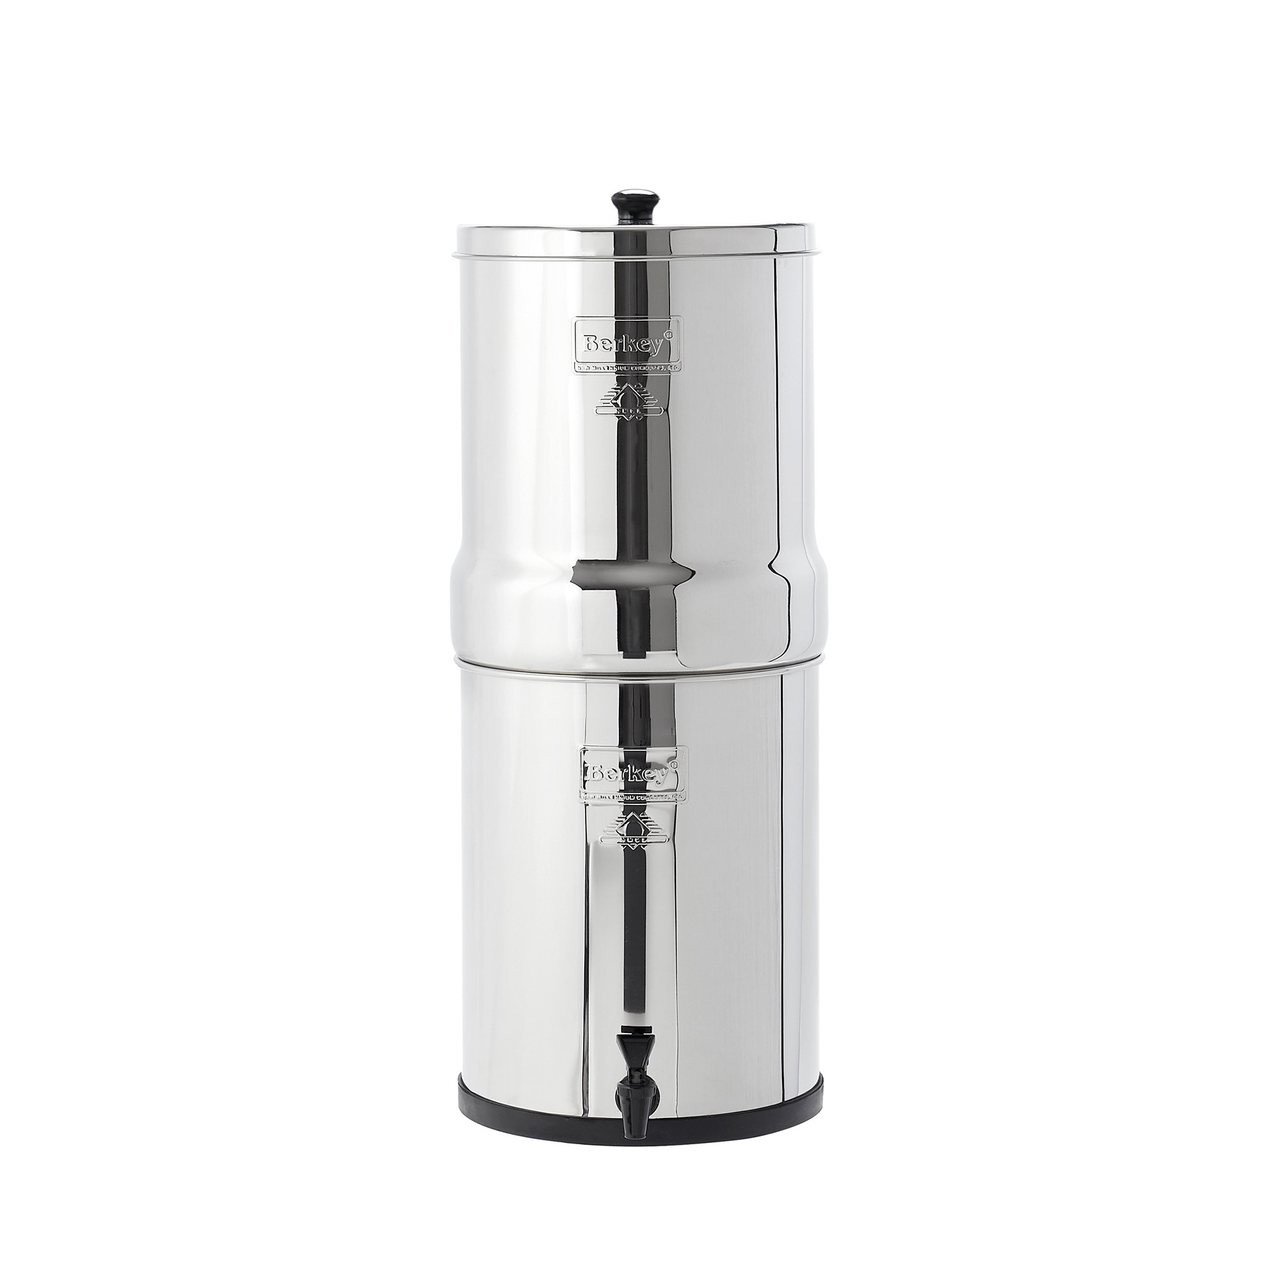 Royal berkey water filter Cylinder Royal Berkey Water Filter Loading Zoom Autoimmune Wellness Royal Berkey Berkey Water Filters Getberkeycom